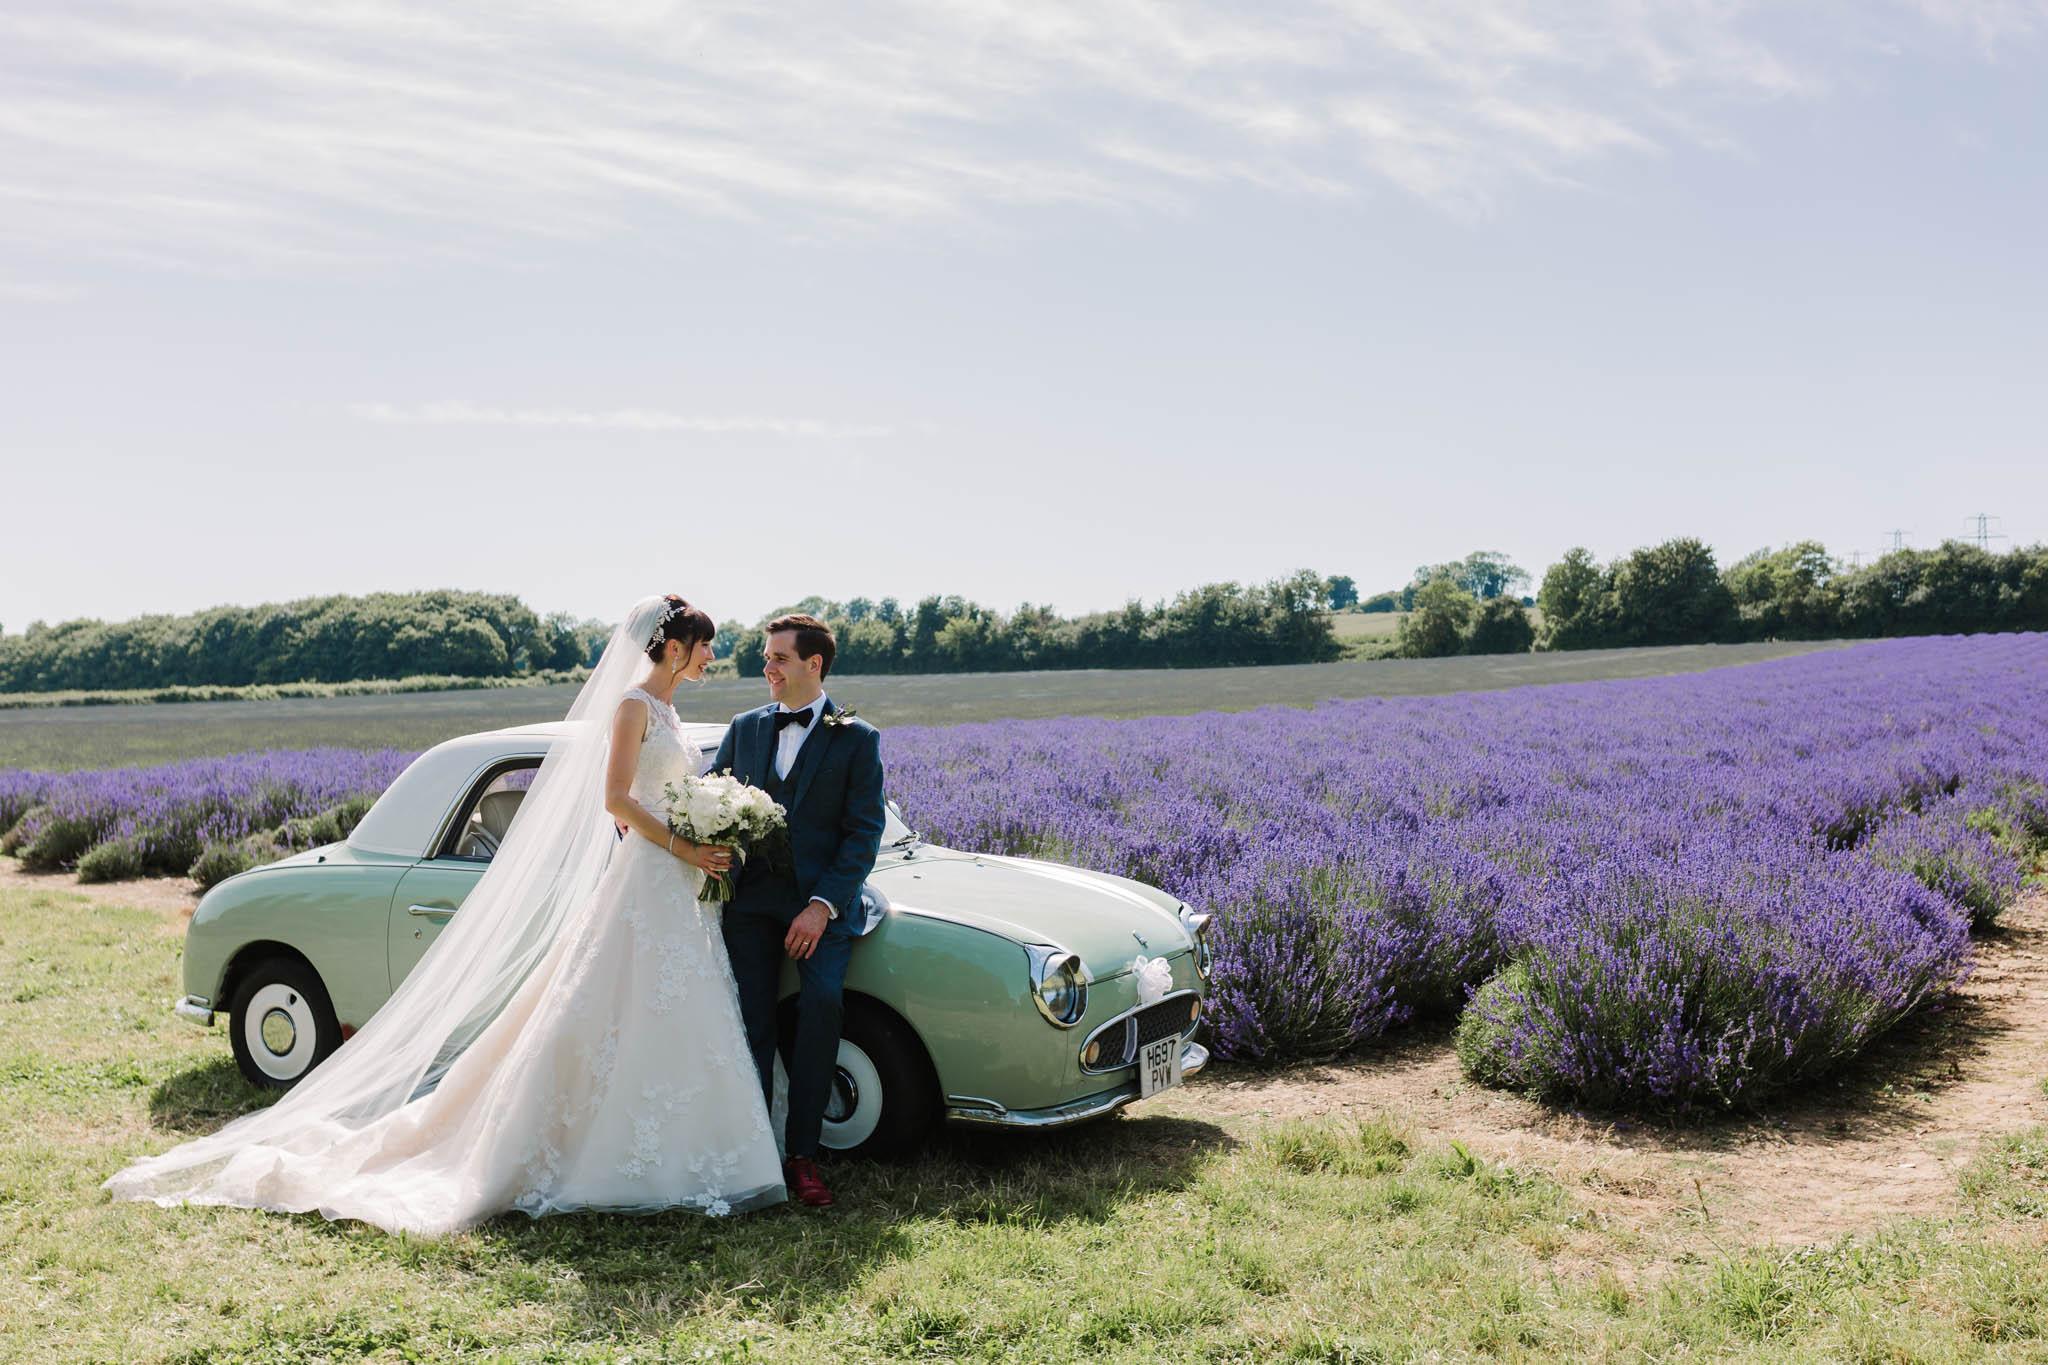 bride and groom with vintage car in lavender field